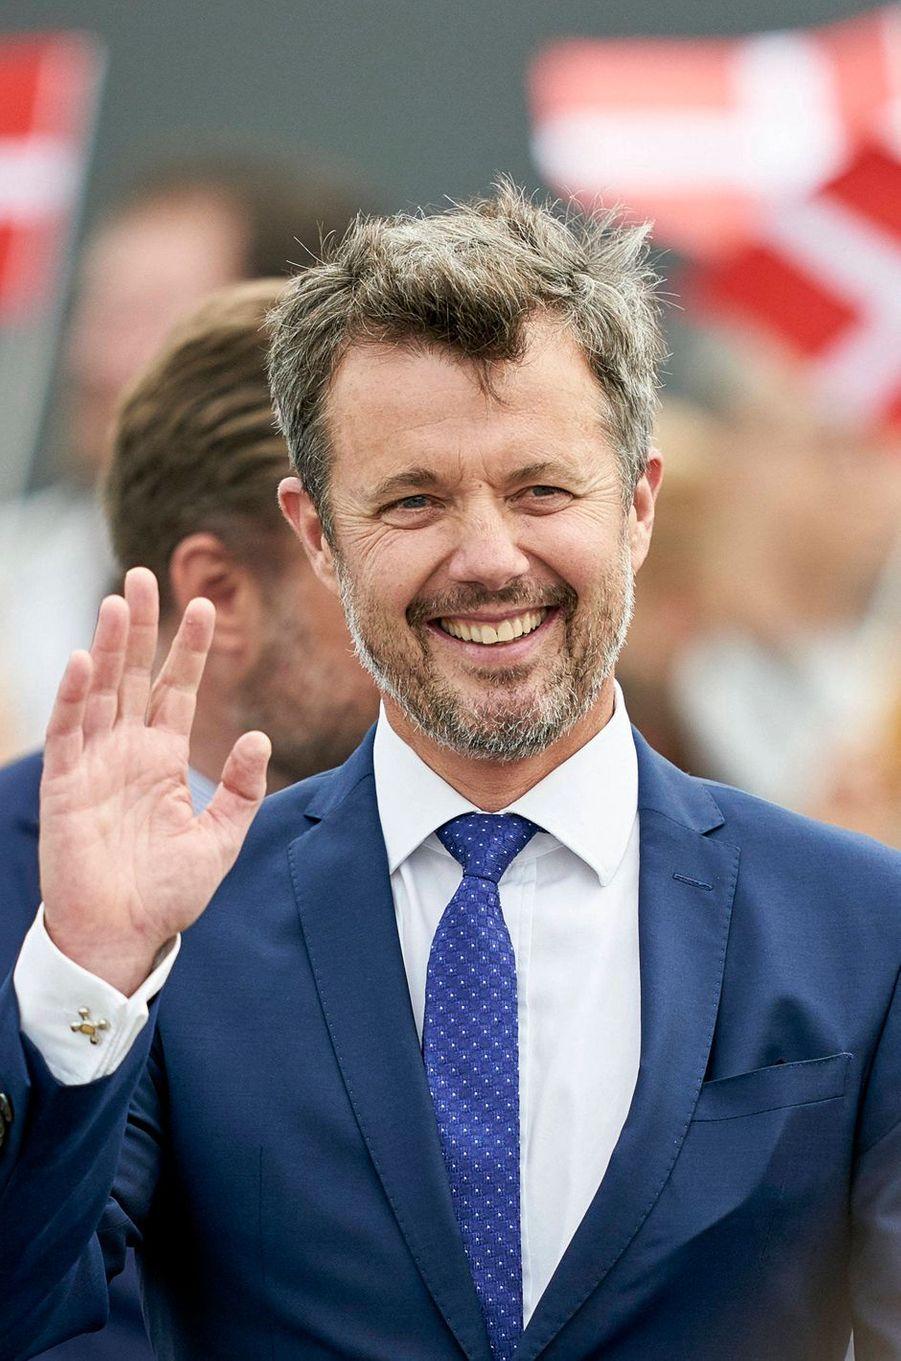 Le prince héritier Frederik de Danemark, le 22 août 2019